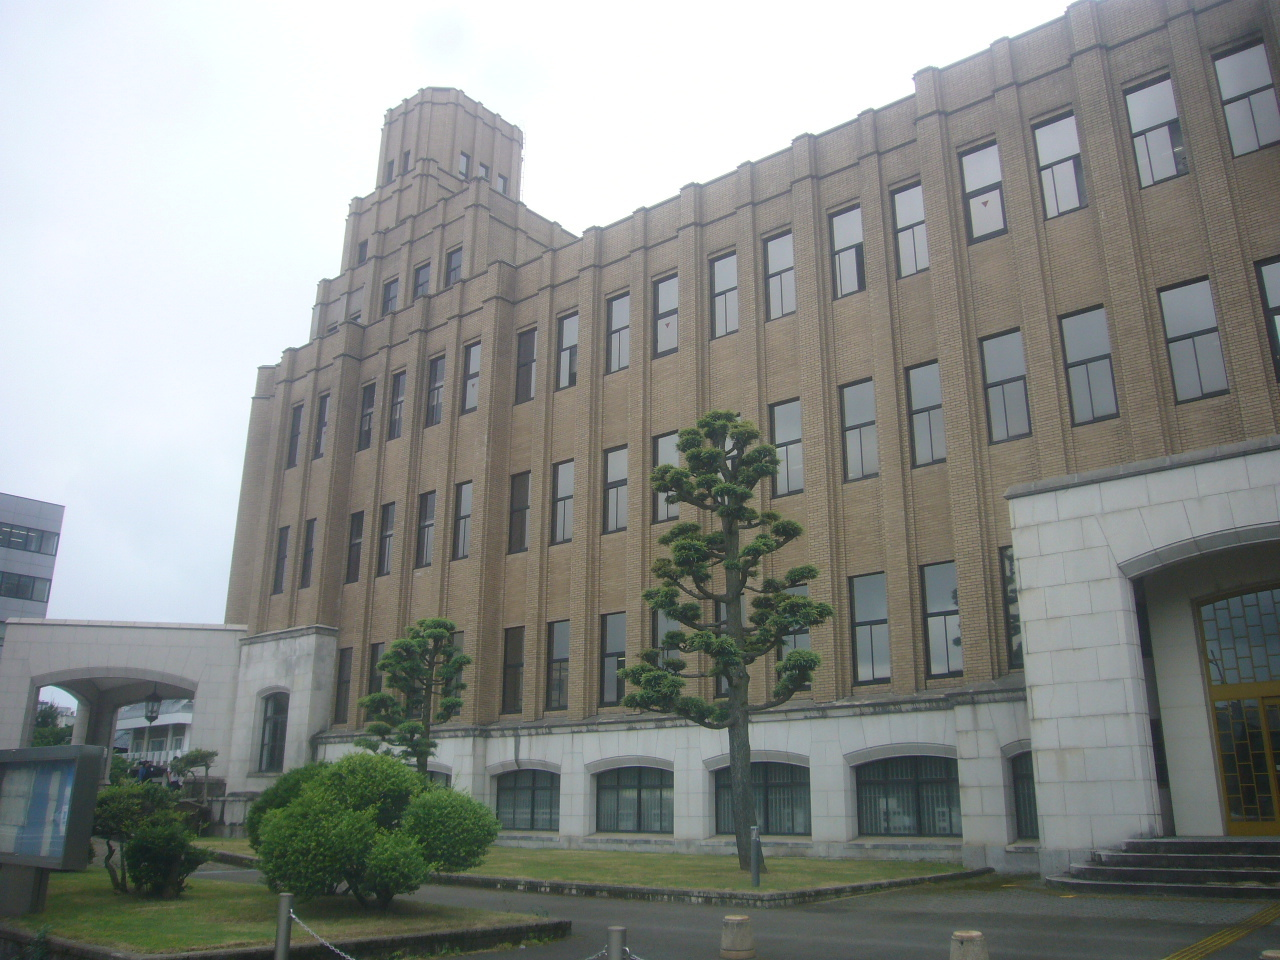 裁判所 R1.6.12